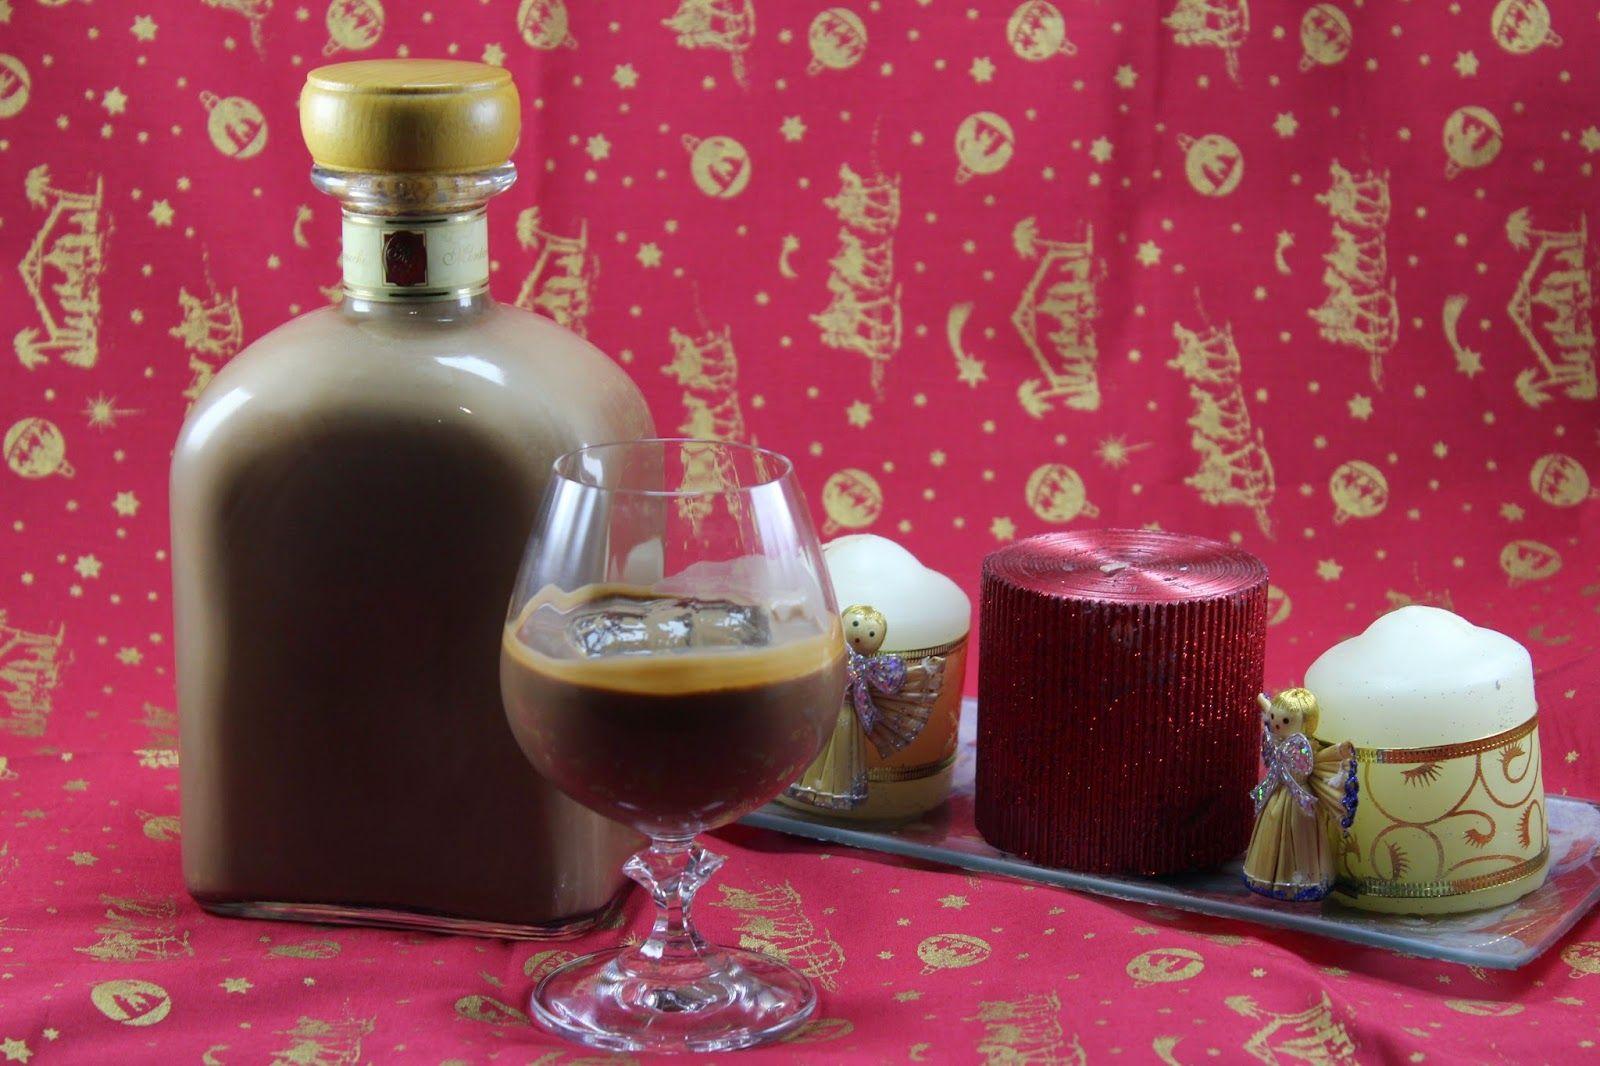 Crema De Chocolate Bebida Ana Sevilla Cocina Tradicional Crema De Chocolate Licor De Chocolate Licor De Crema